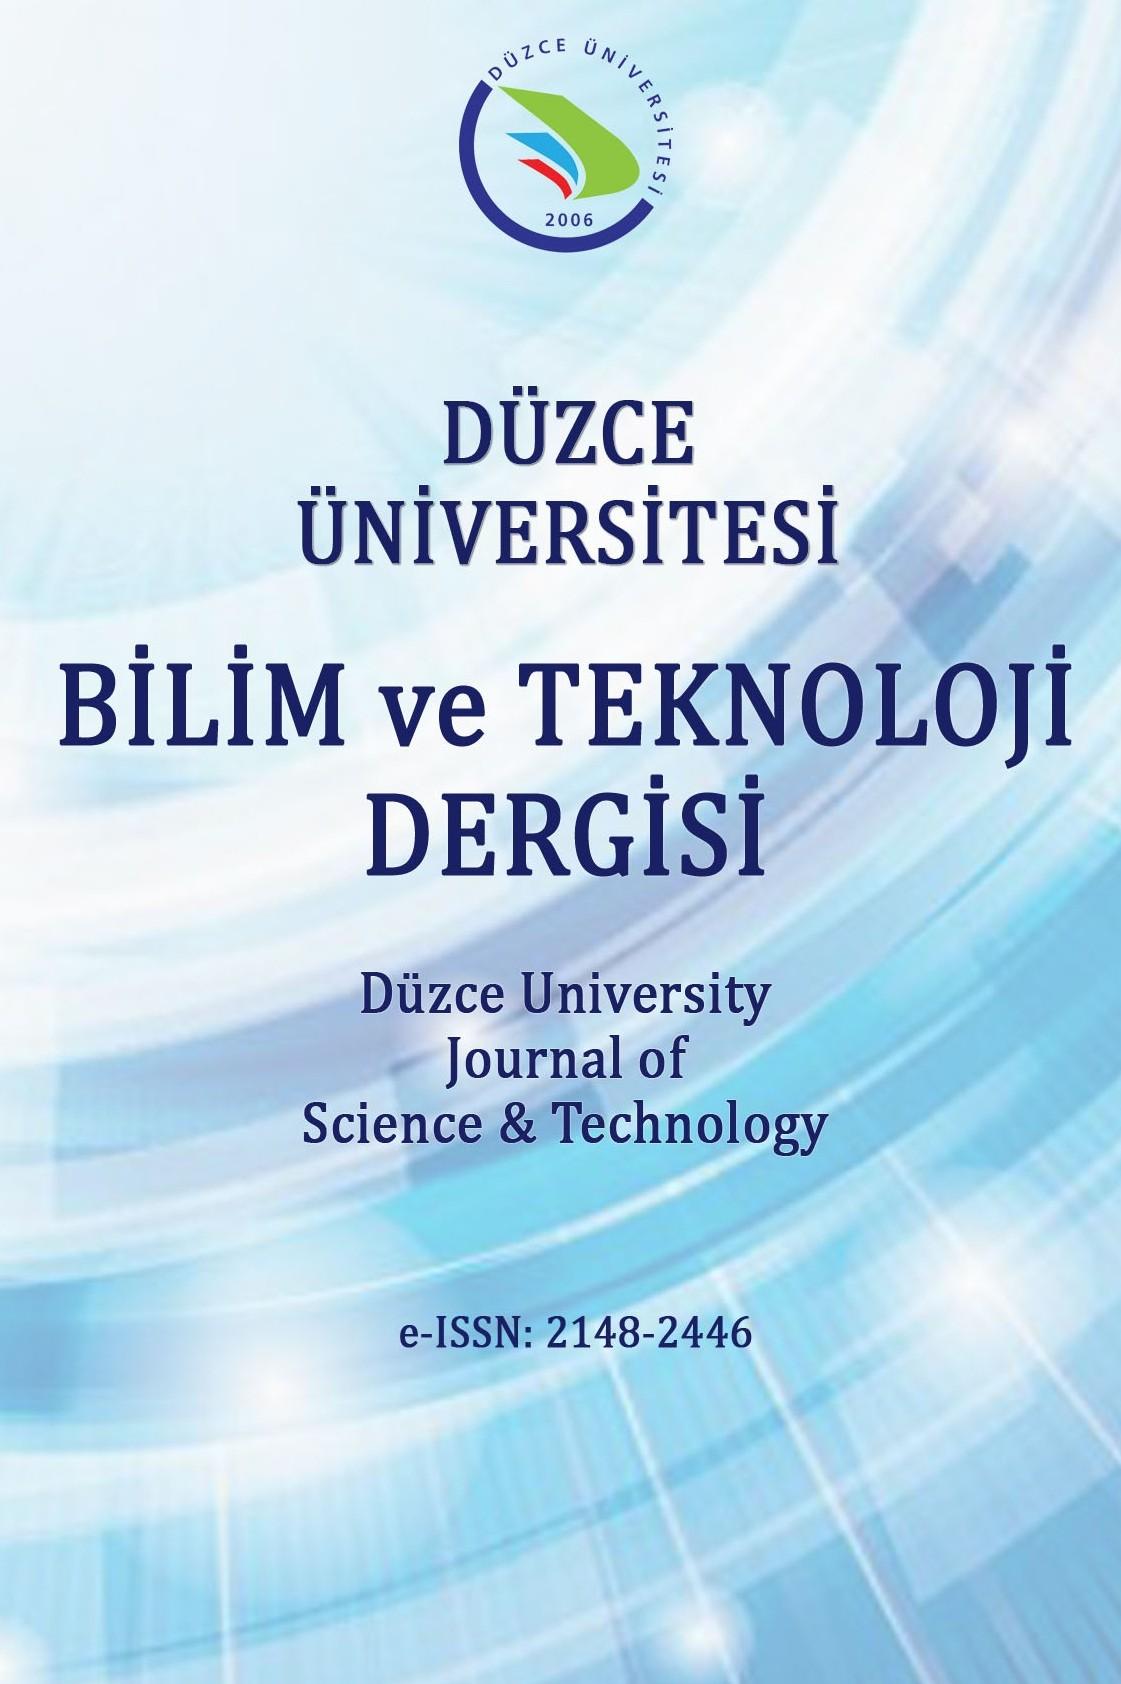 Duzce University Journal of Science & Technology